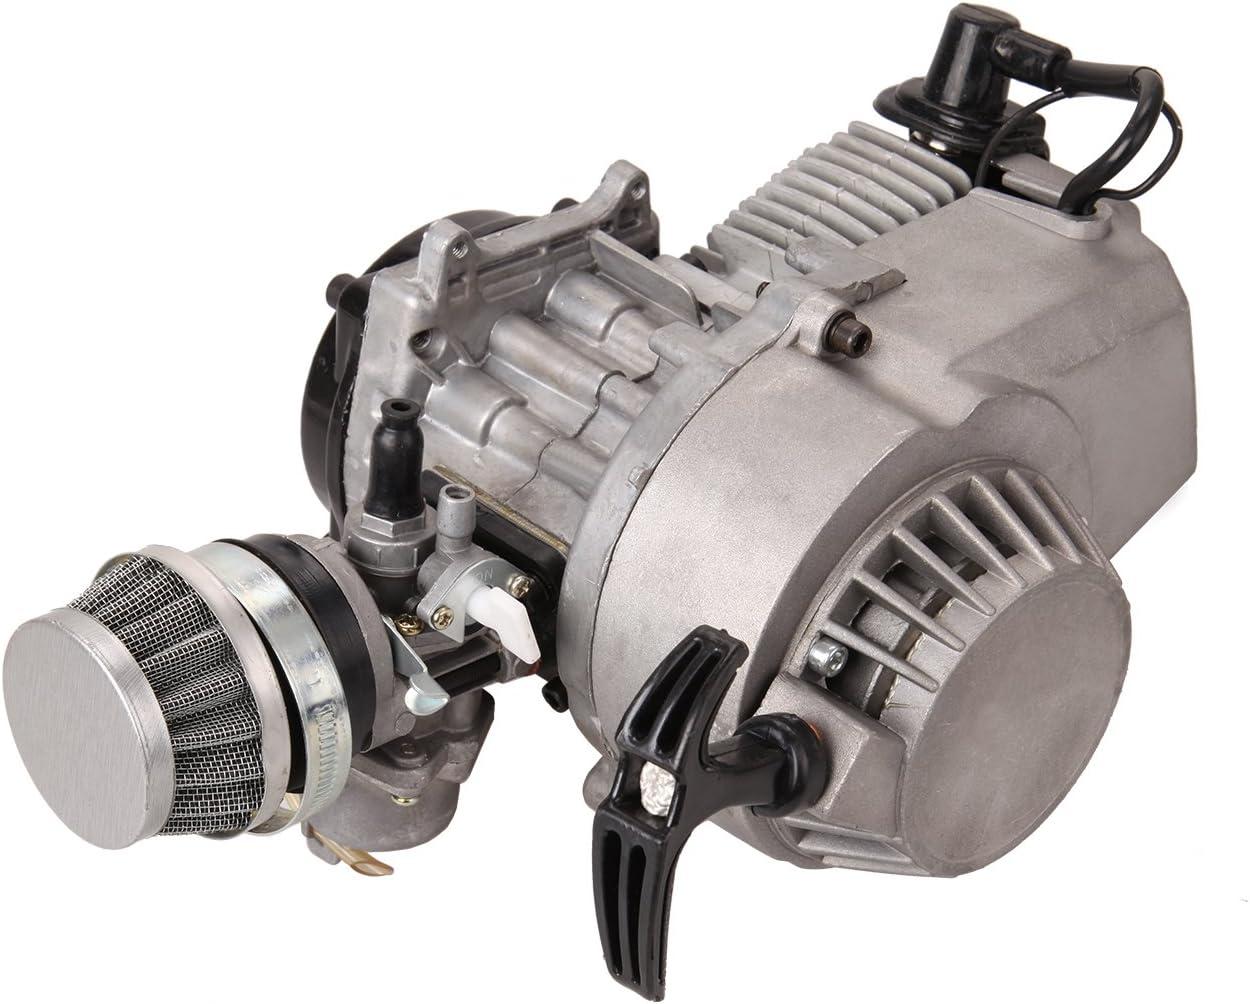 Samger Samger49cc 2 Tiempos Motor Mini Motor Pullstart Carburador Filtro de Aire Cabeza Dirt Bike Quad Pocket Bike